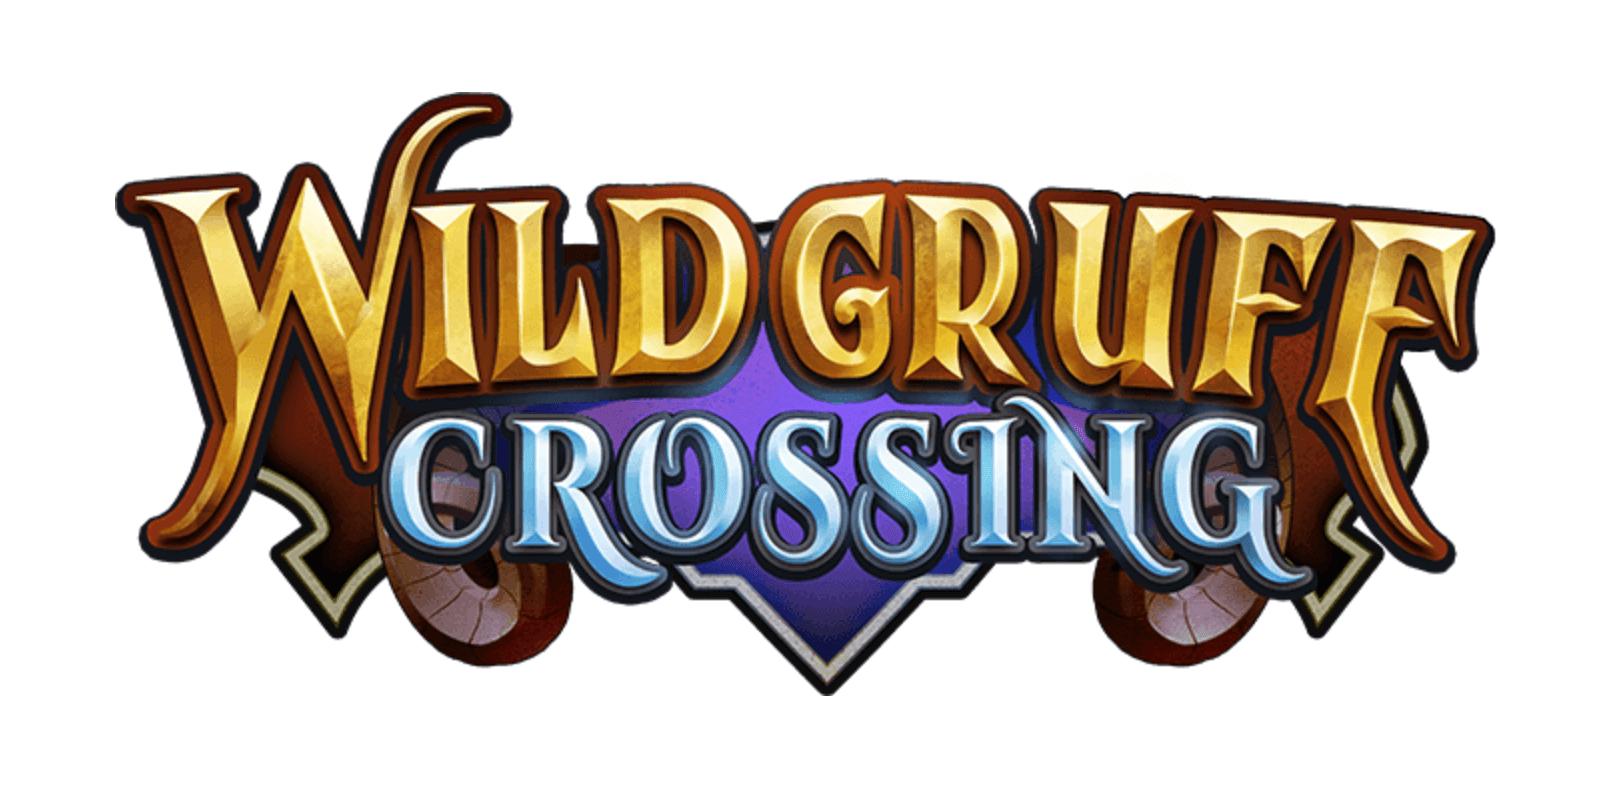 wild gruff crossing logo